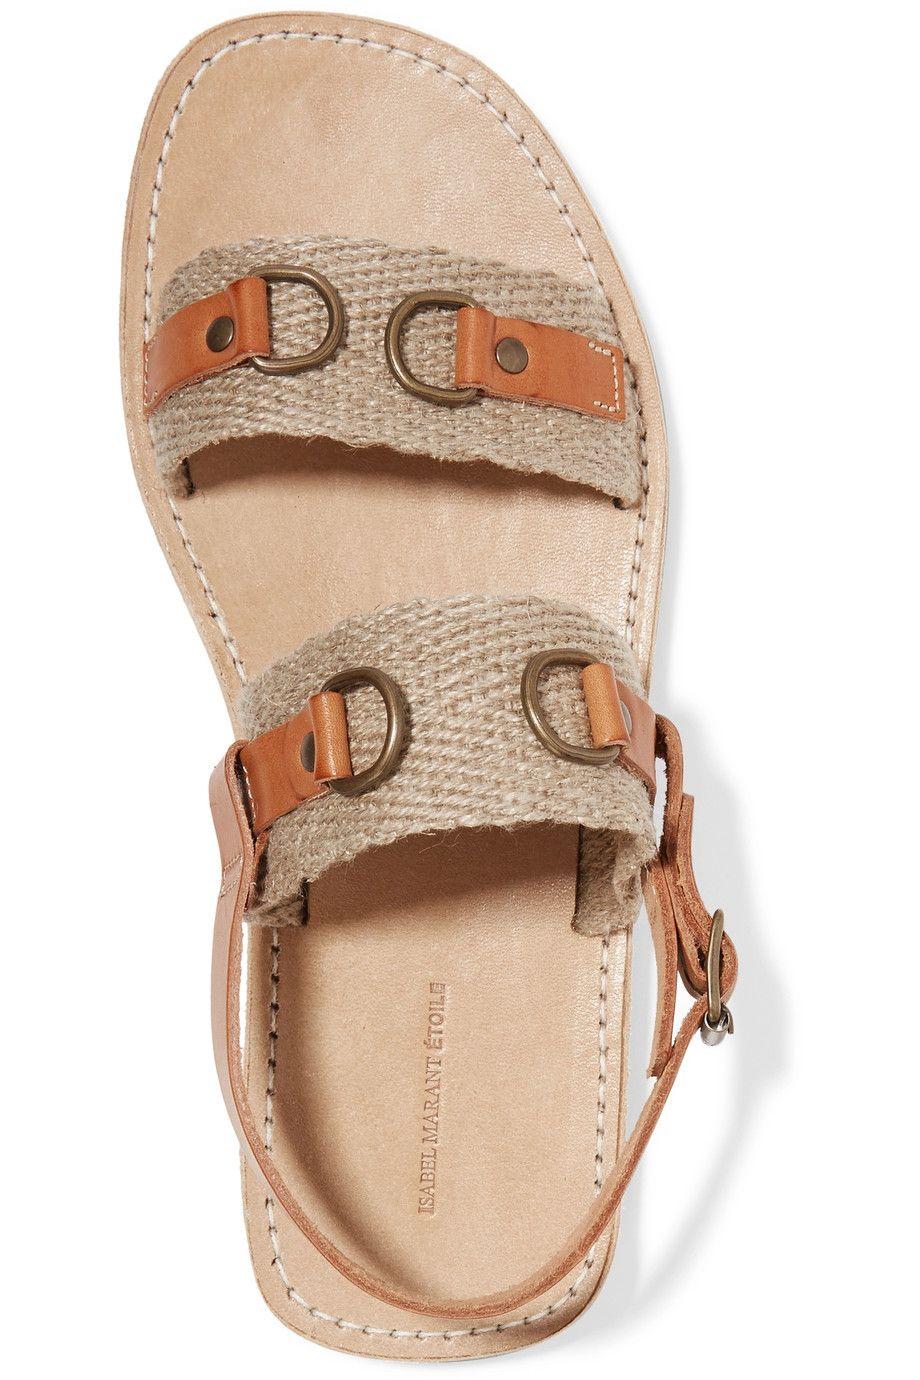 Shop onsale Étoile Isabel Marant Jess paneled leather and